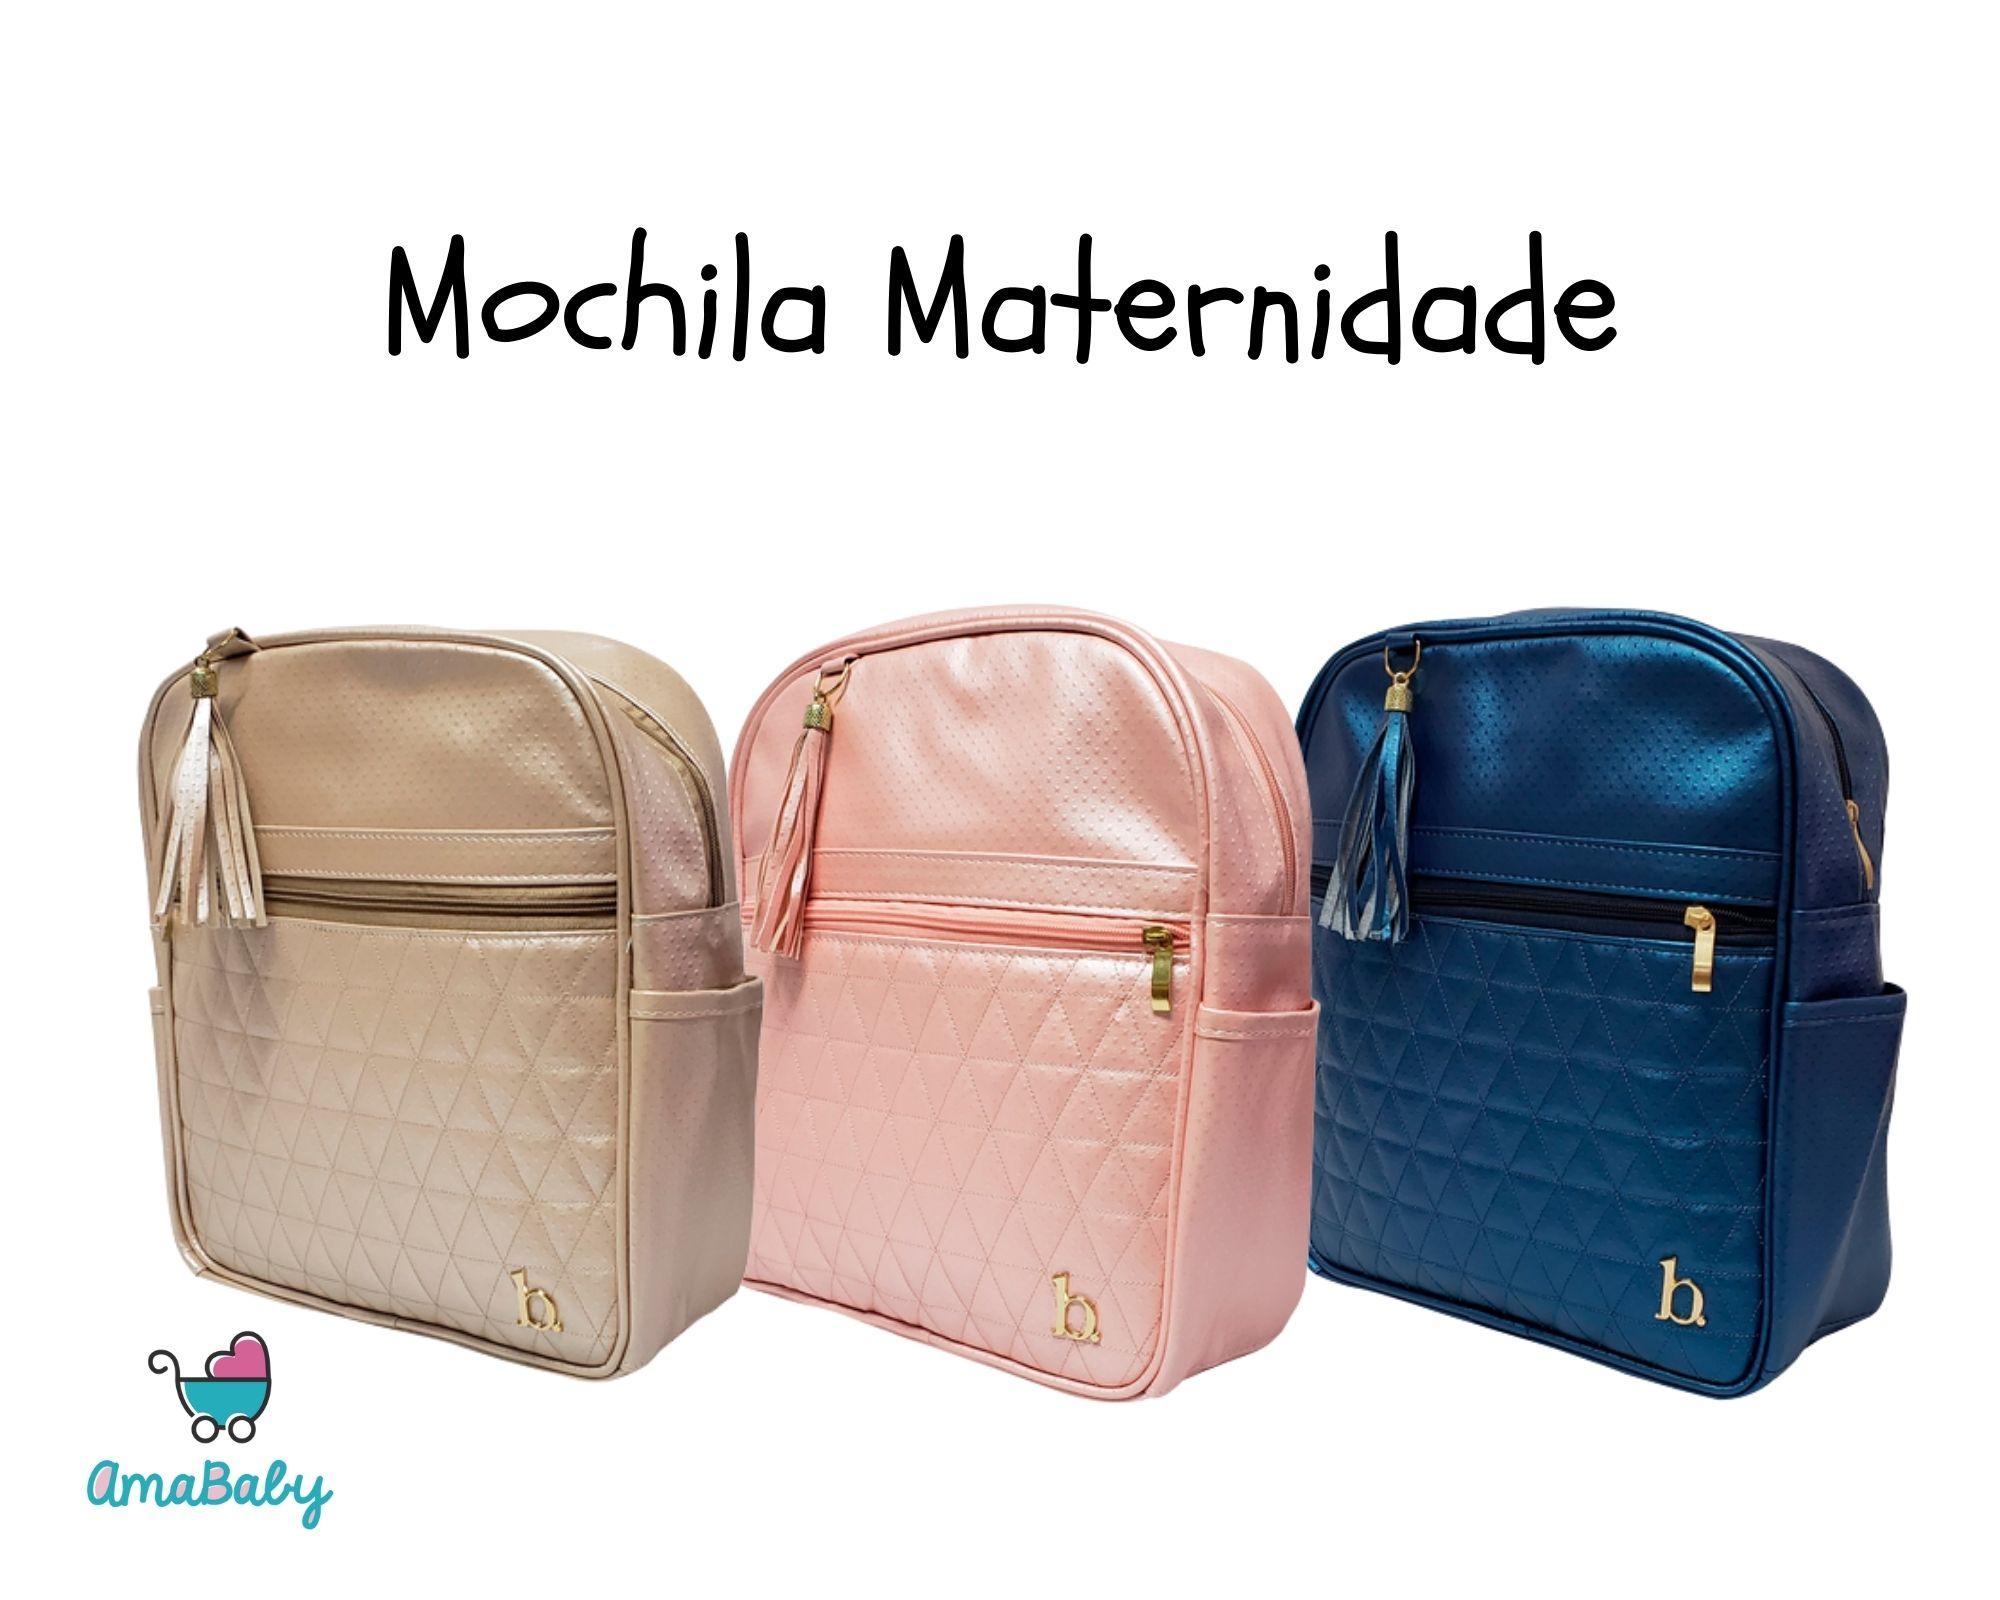 Mochila Maternidade Lotus Boni